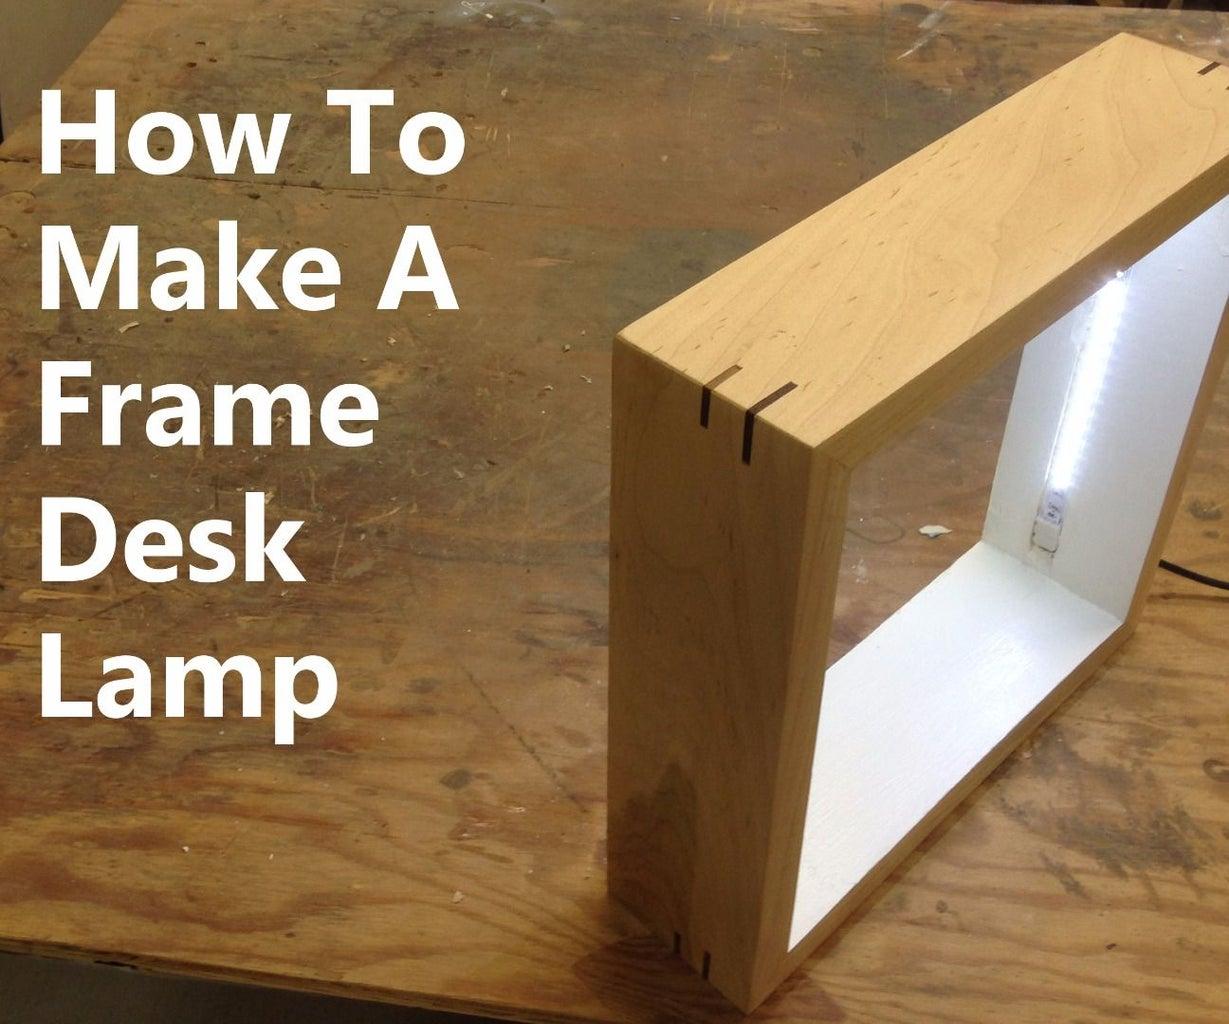 Picture Frame Desk Lamp